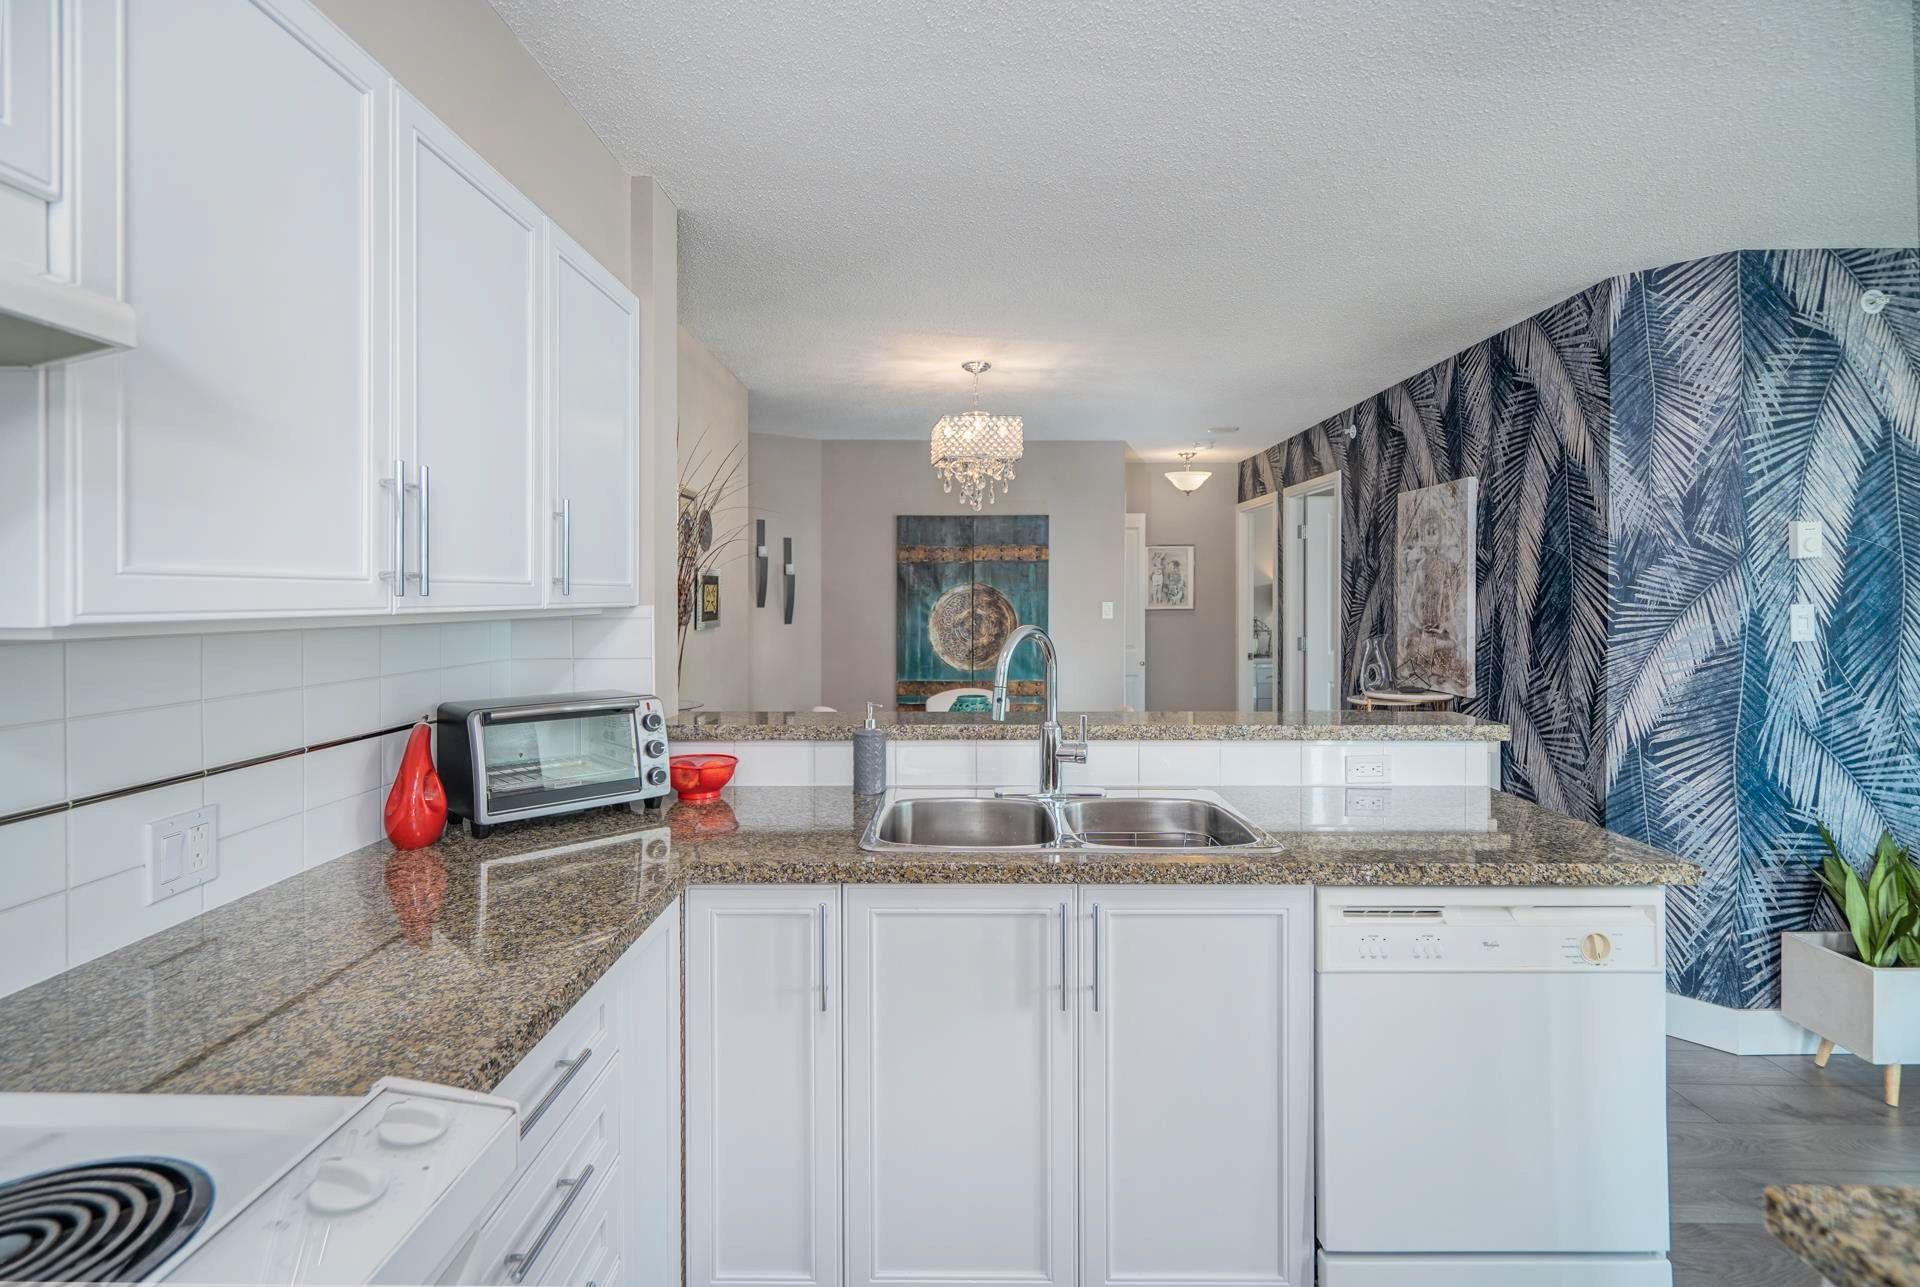 "Photo 12: Photos: 704 4388 BUCHANAN Street in Burnaby: Brentwood Park Condo for sale in ""Buchanan West"" (Burnaby North)  : MLS®# R2607208"